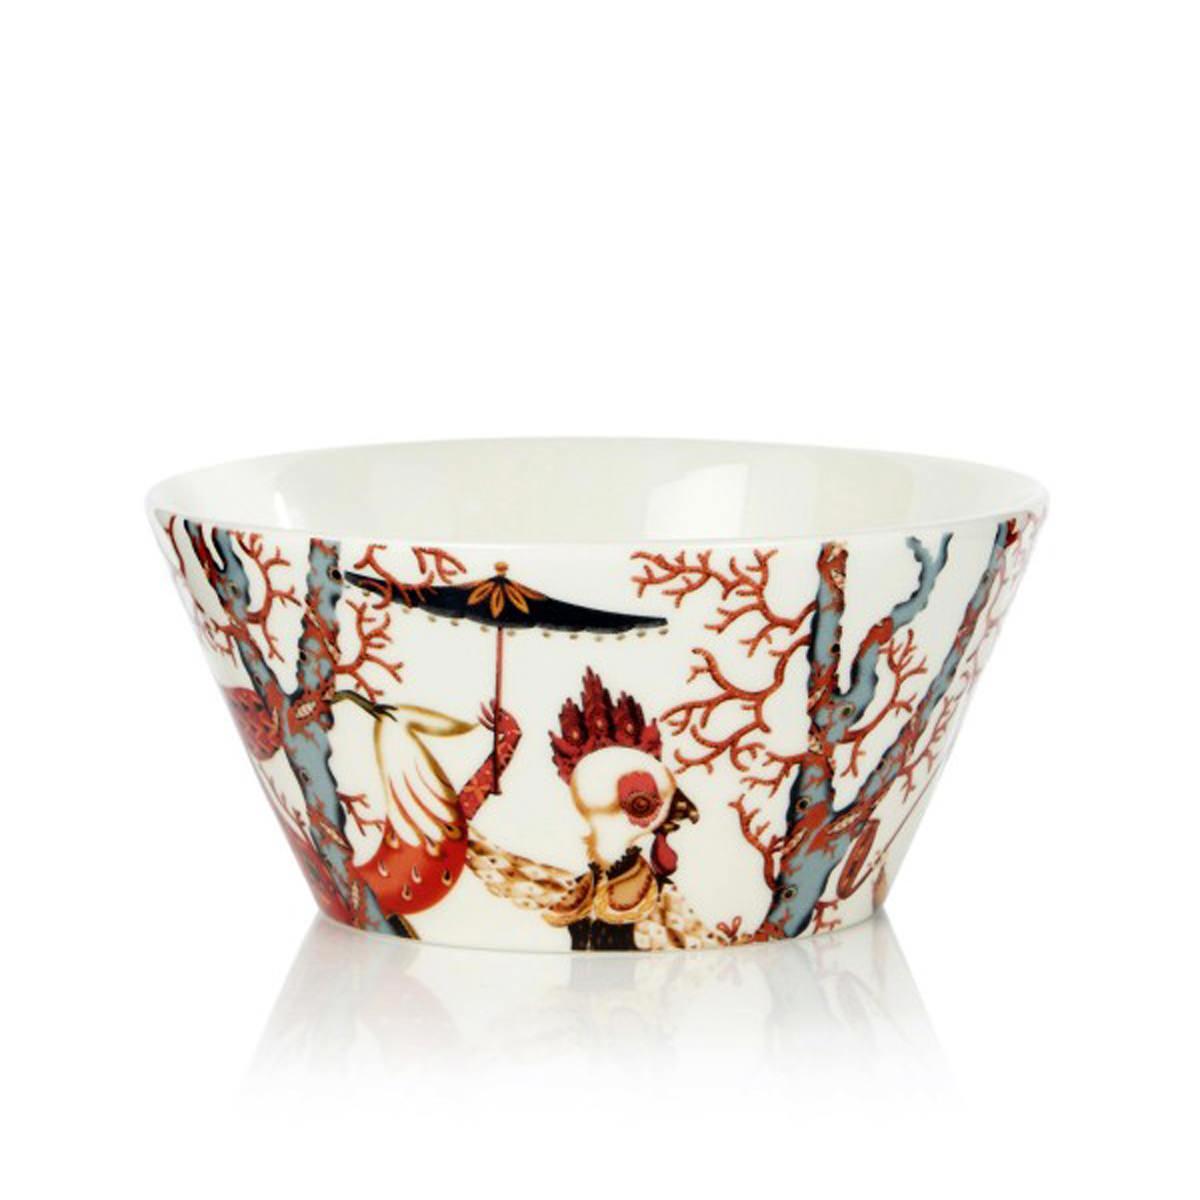 Iittala Tanssi Bowl